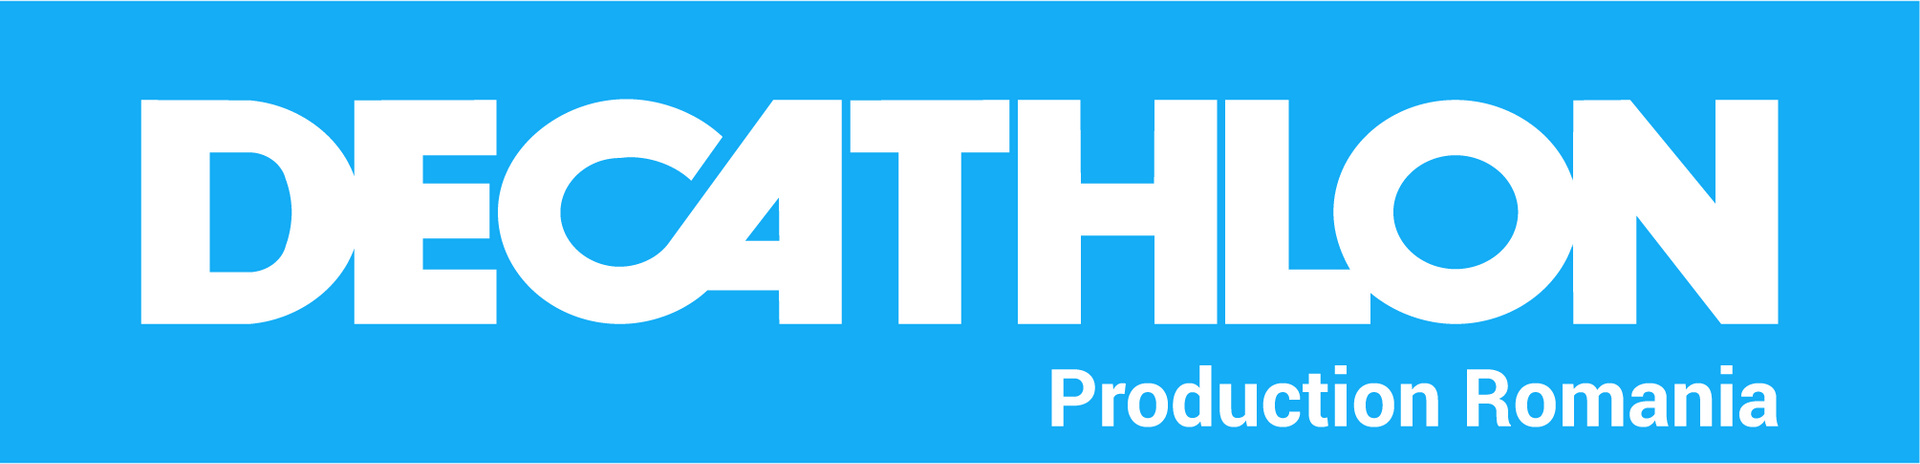 Decathlon_Logo-01